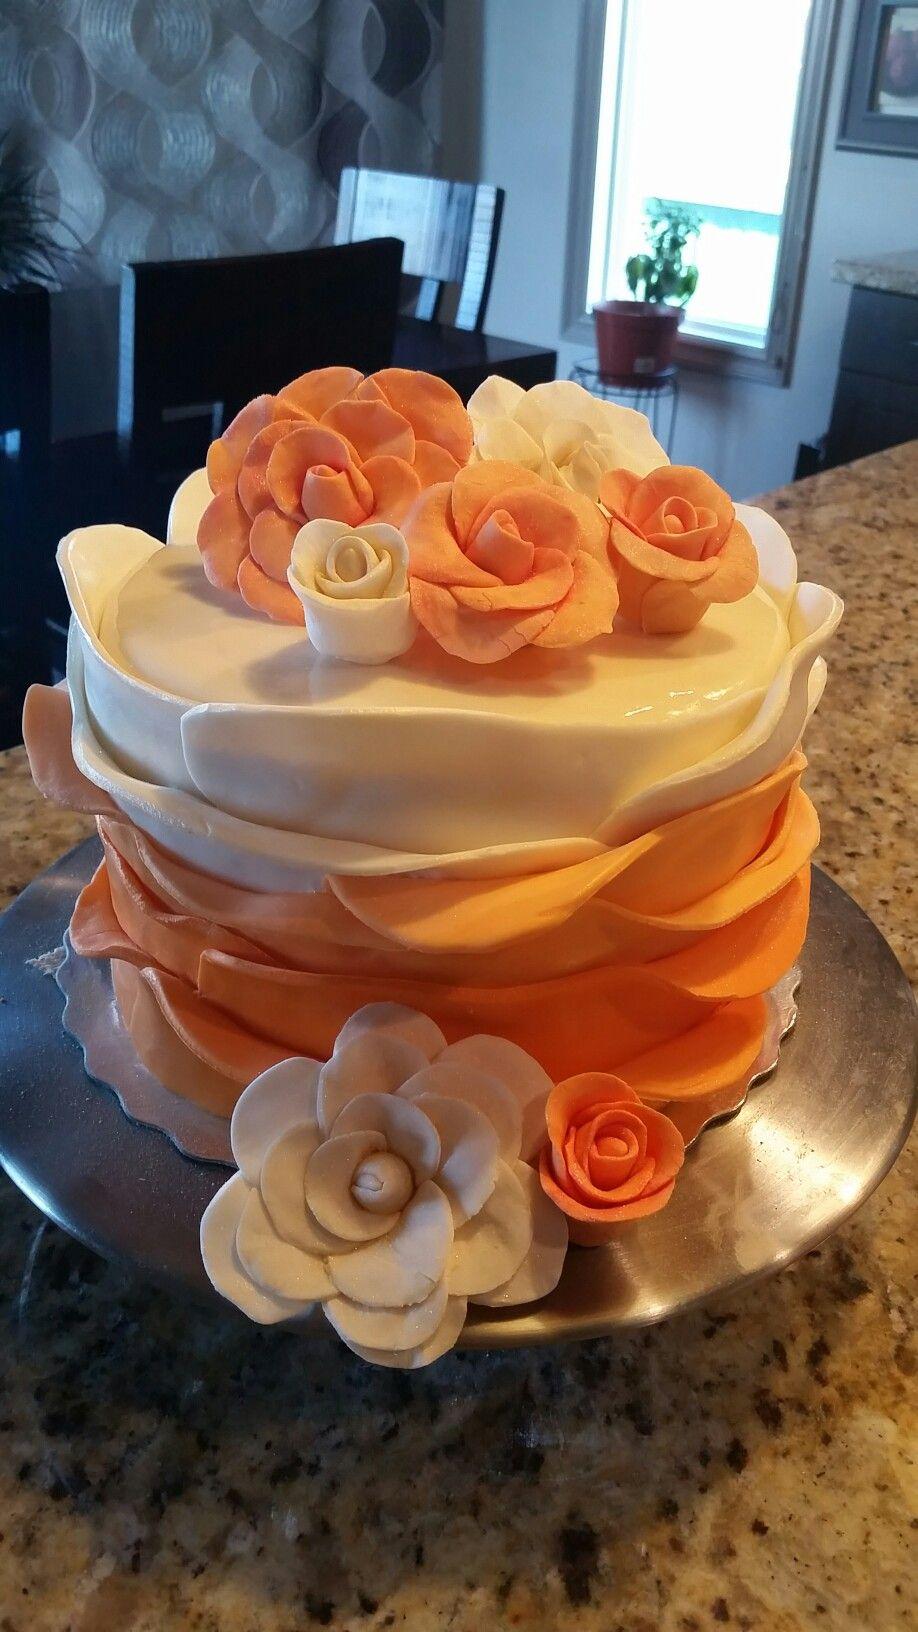 Pin by Vangie Flynn on Cakes atbp. Cake, Grandma